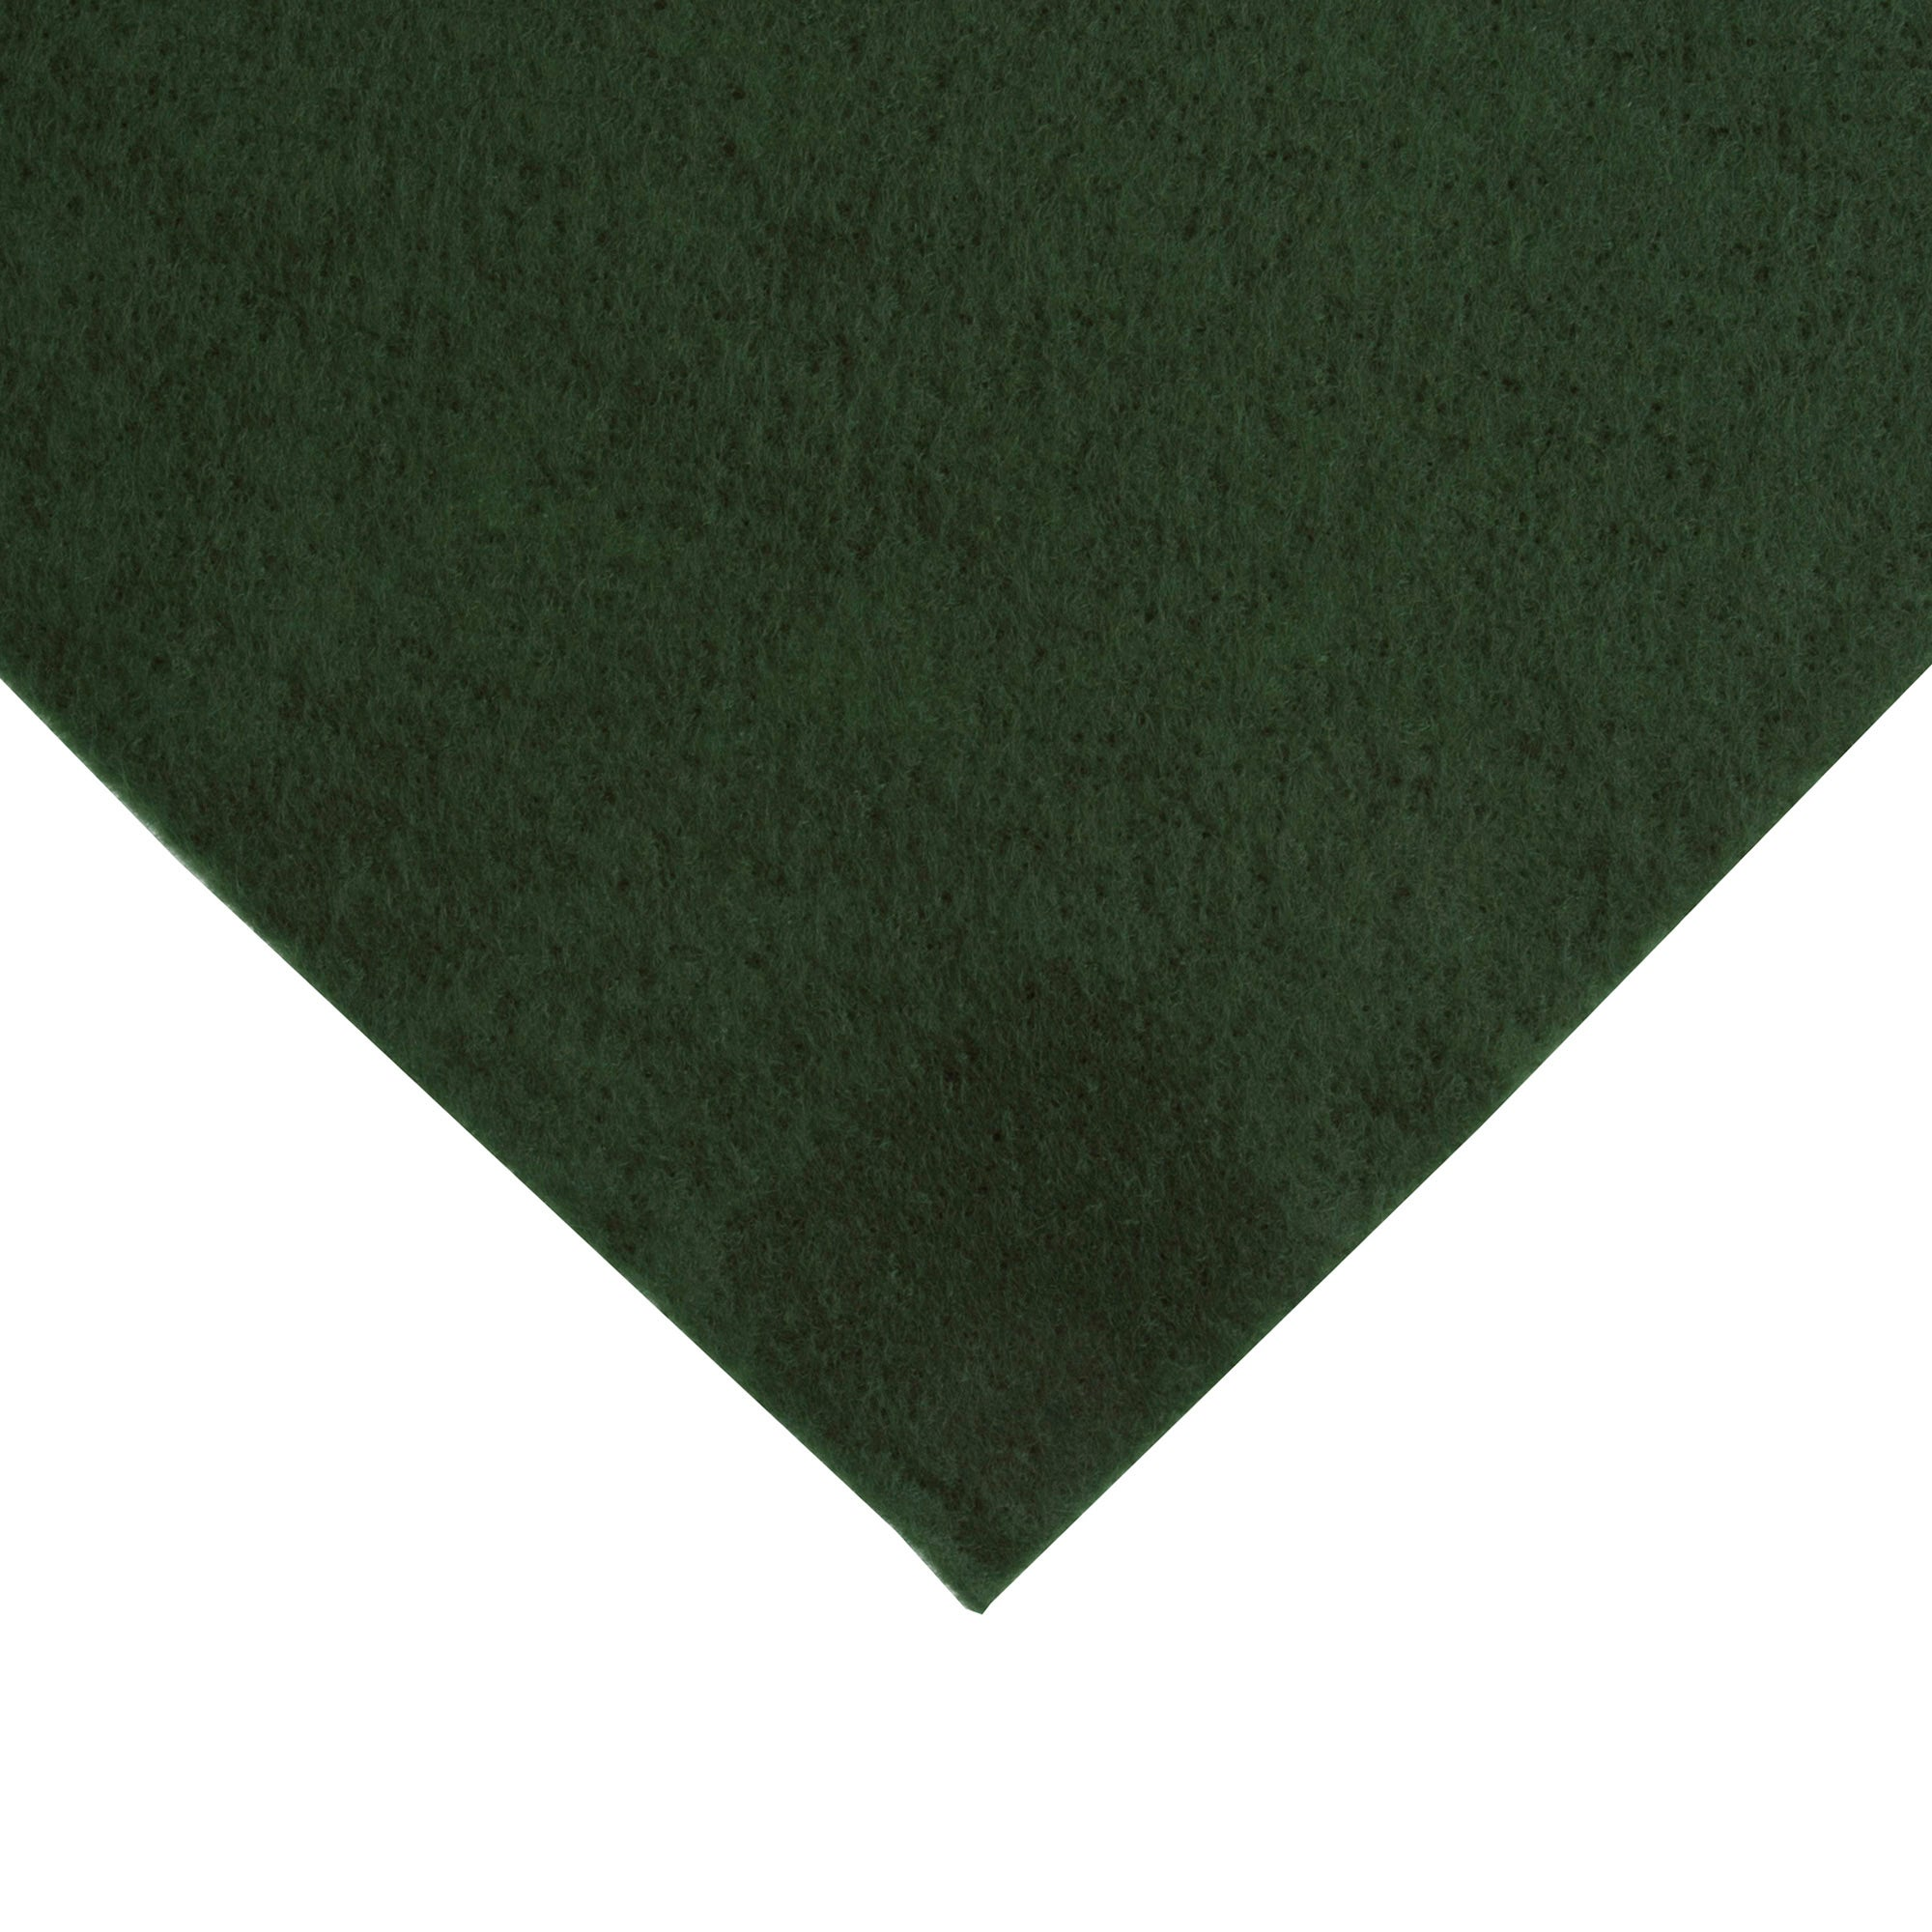 Photo of Minicraft felt roll green